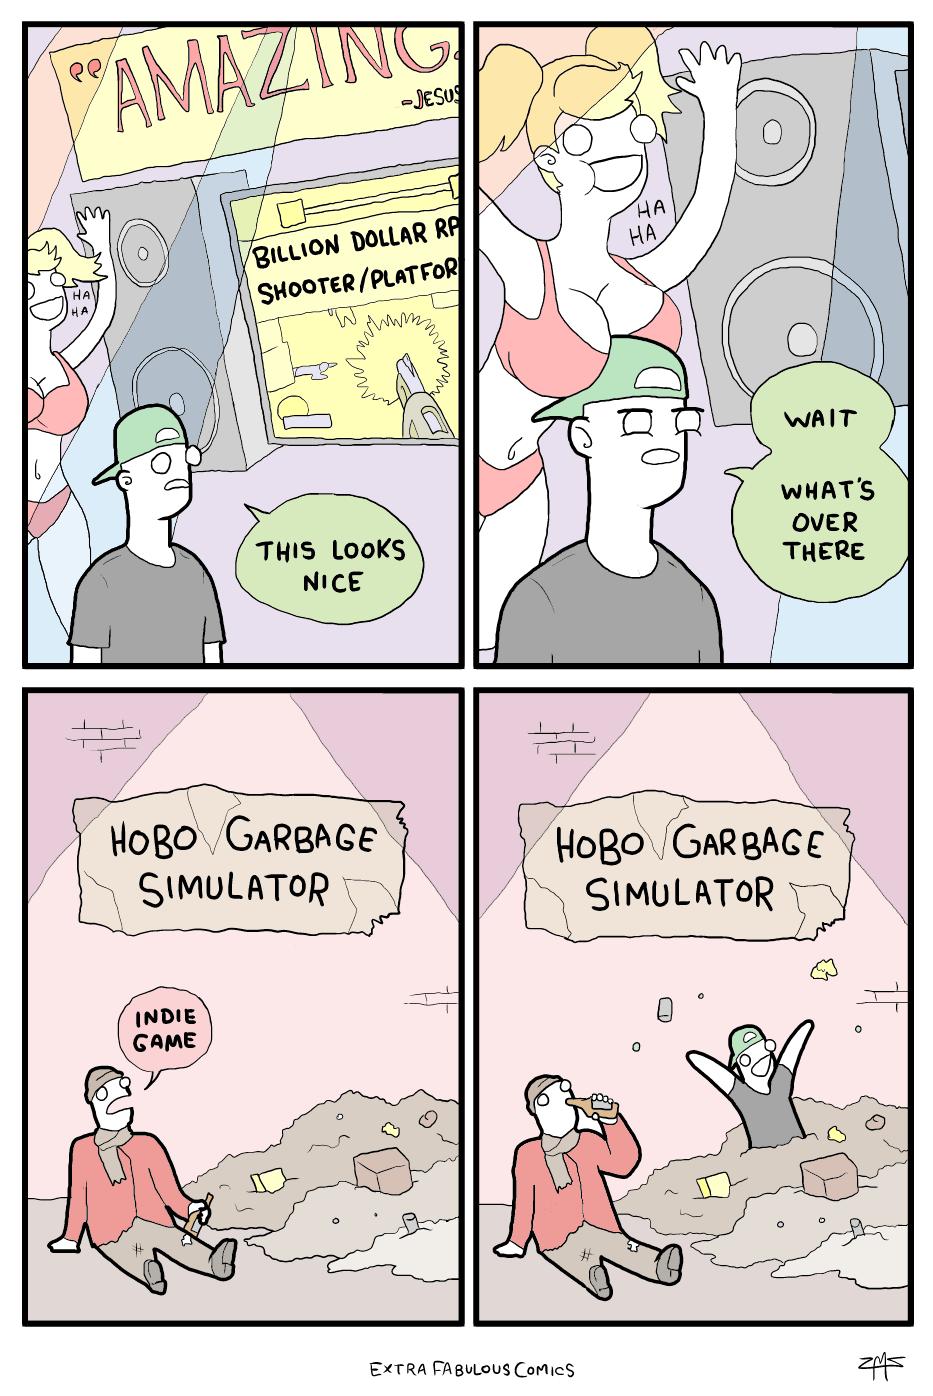 Hobo garbage simulator